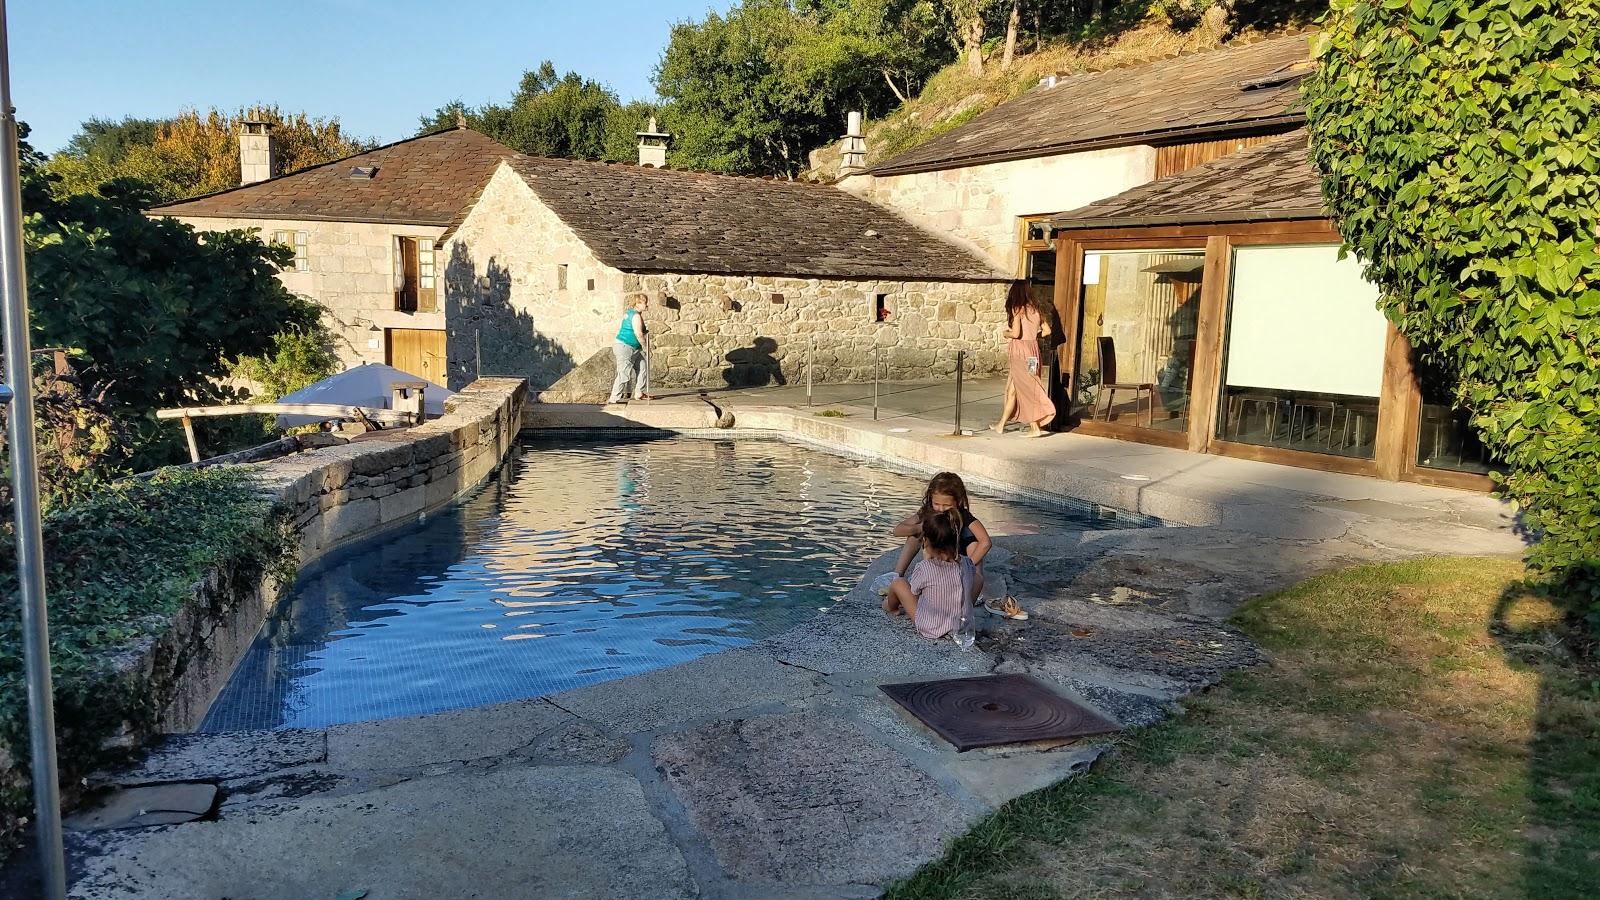 The pool area at the Fervenza Casa Grande outside Palas de Rei.